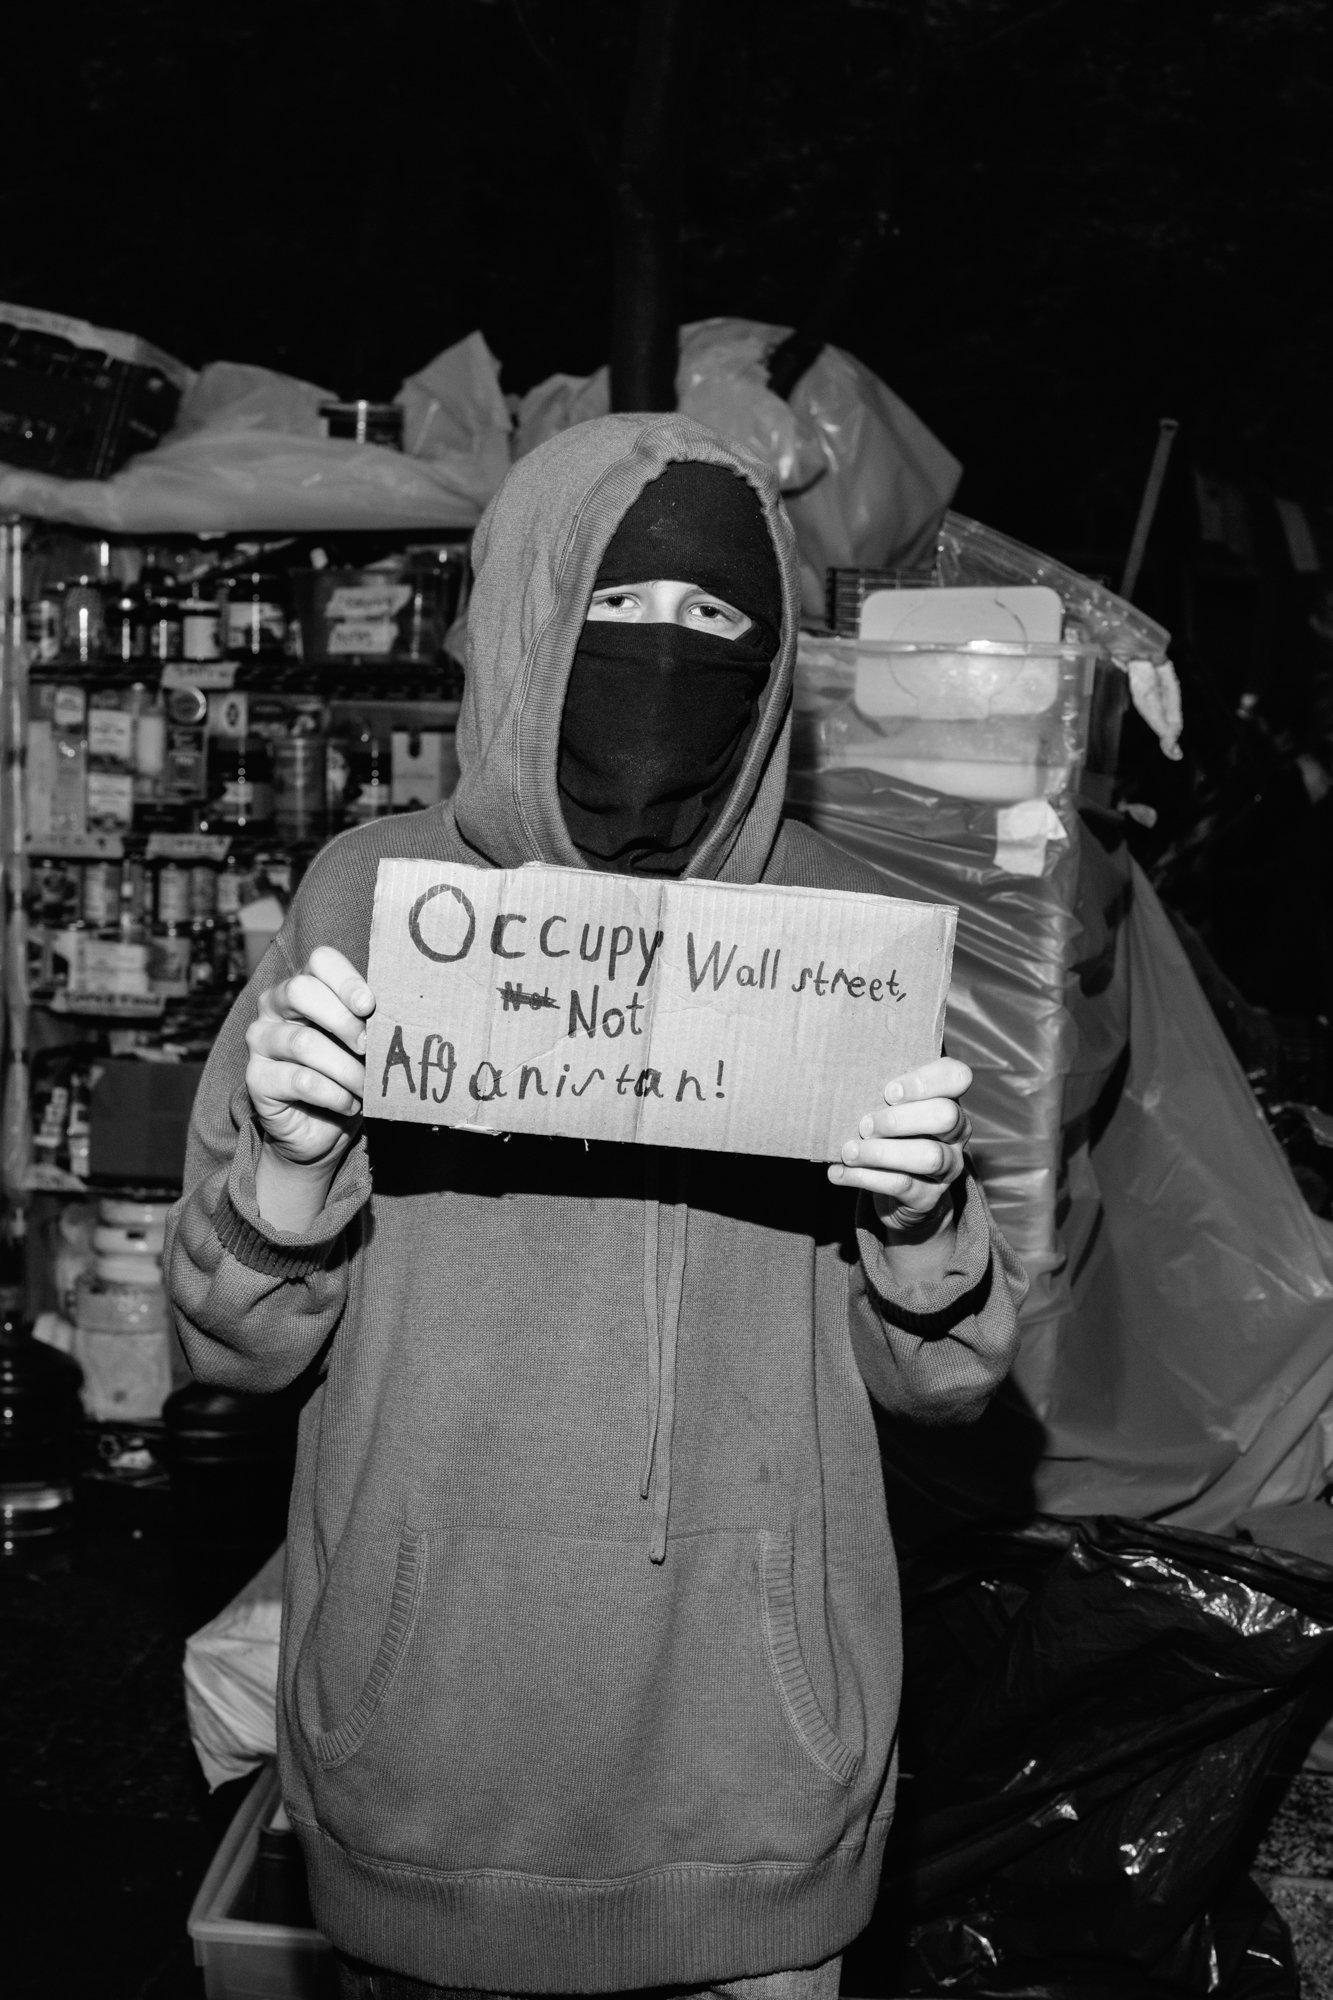 JohnFPeters_WEB_OccupyWallSt_001.JPG